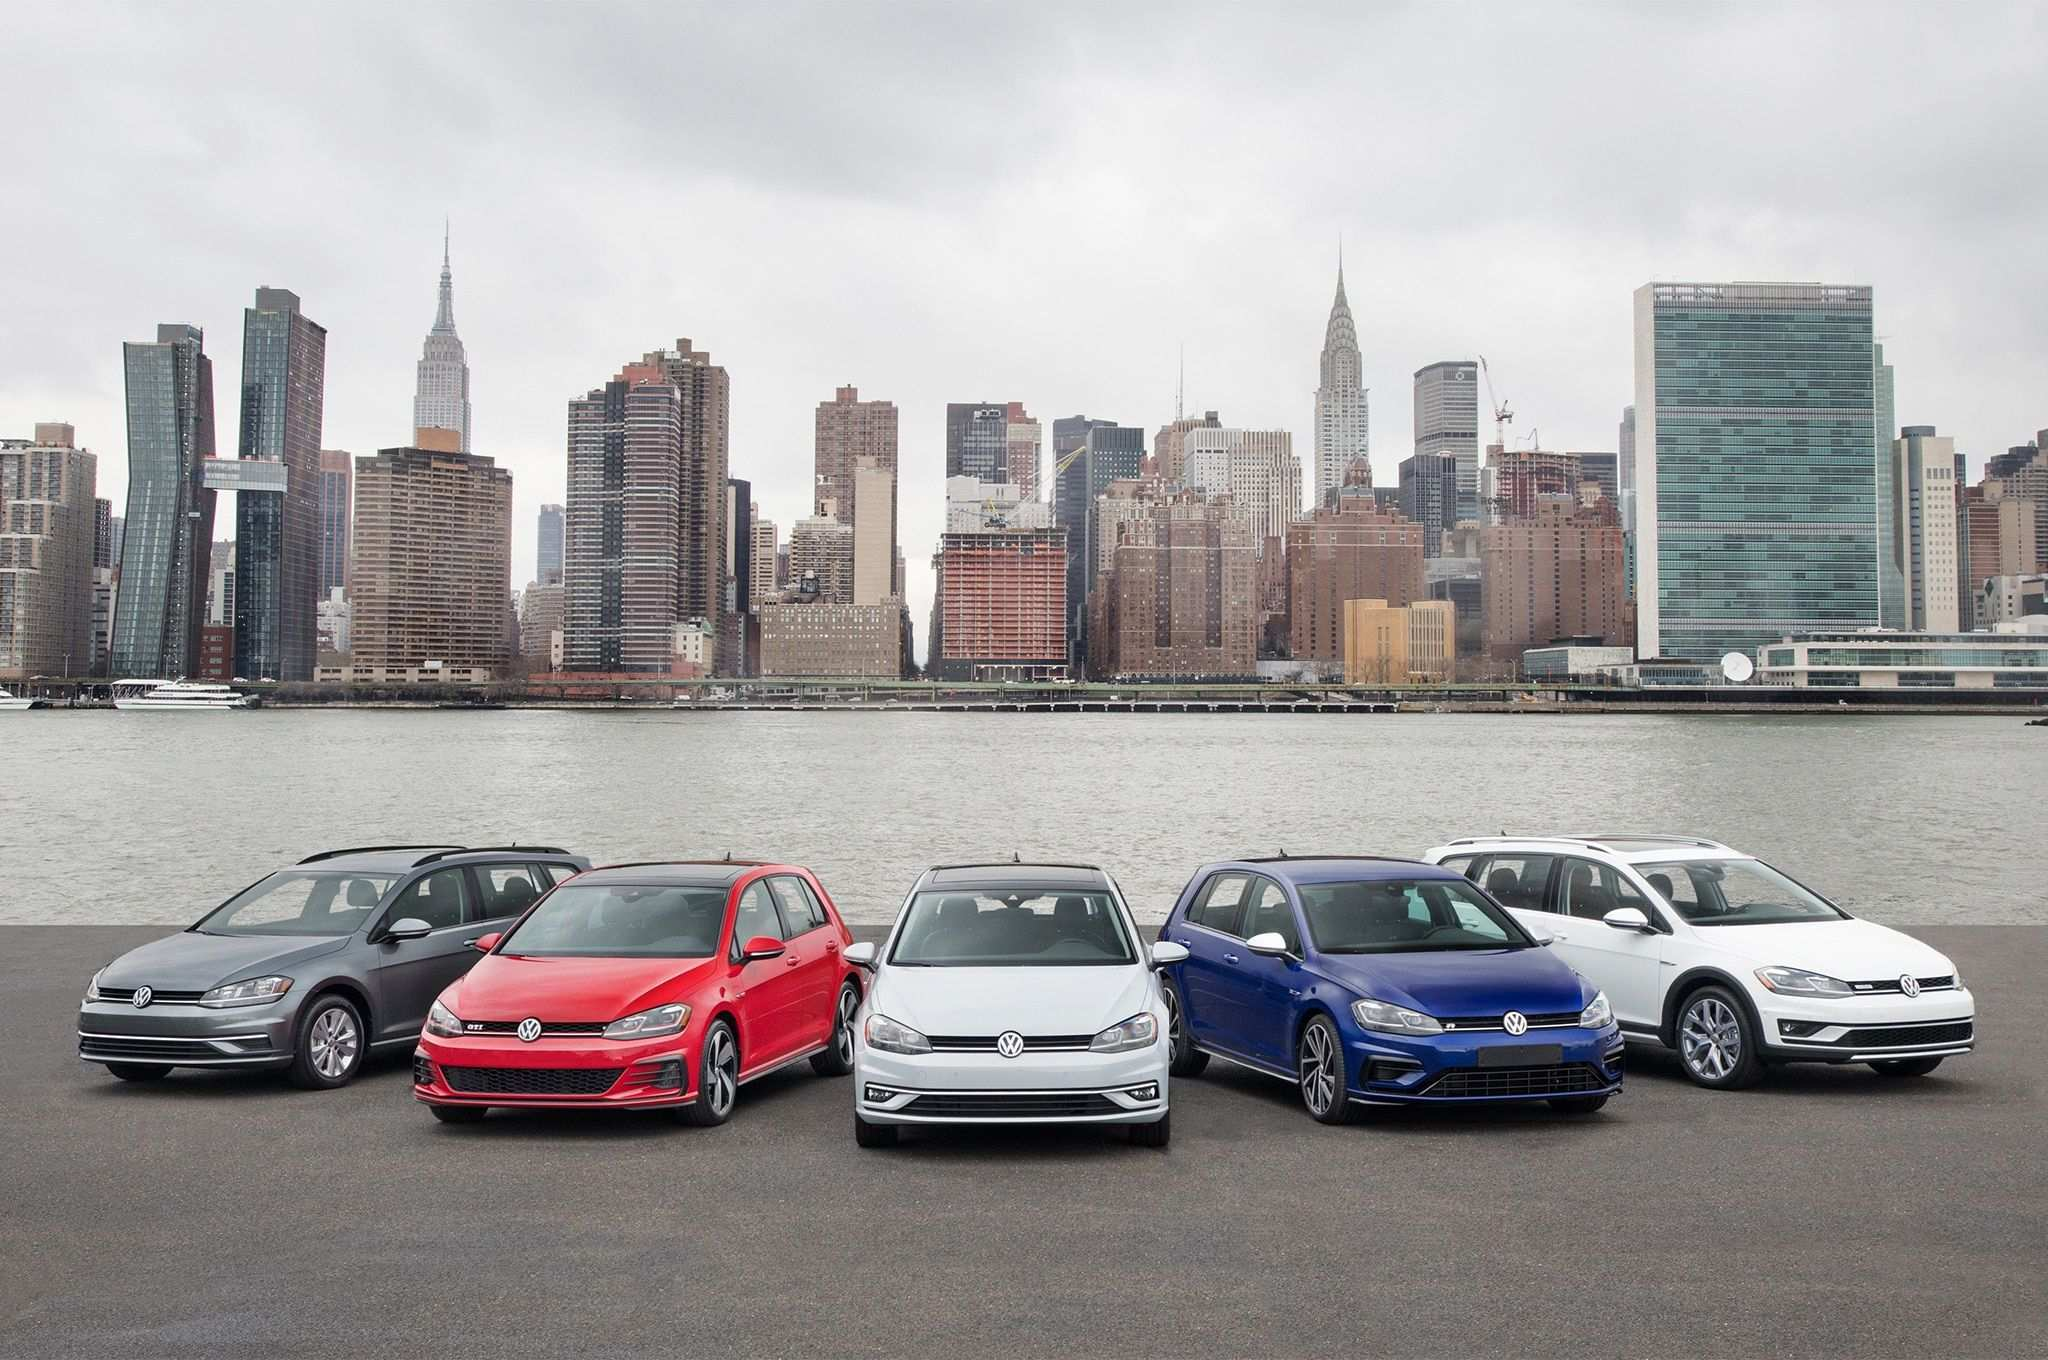 68 Concept of Volkswagen Lineup 2019 Research New with Volkswagen Lineup 2019